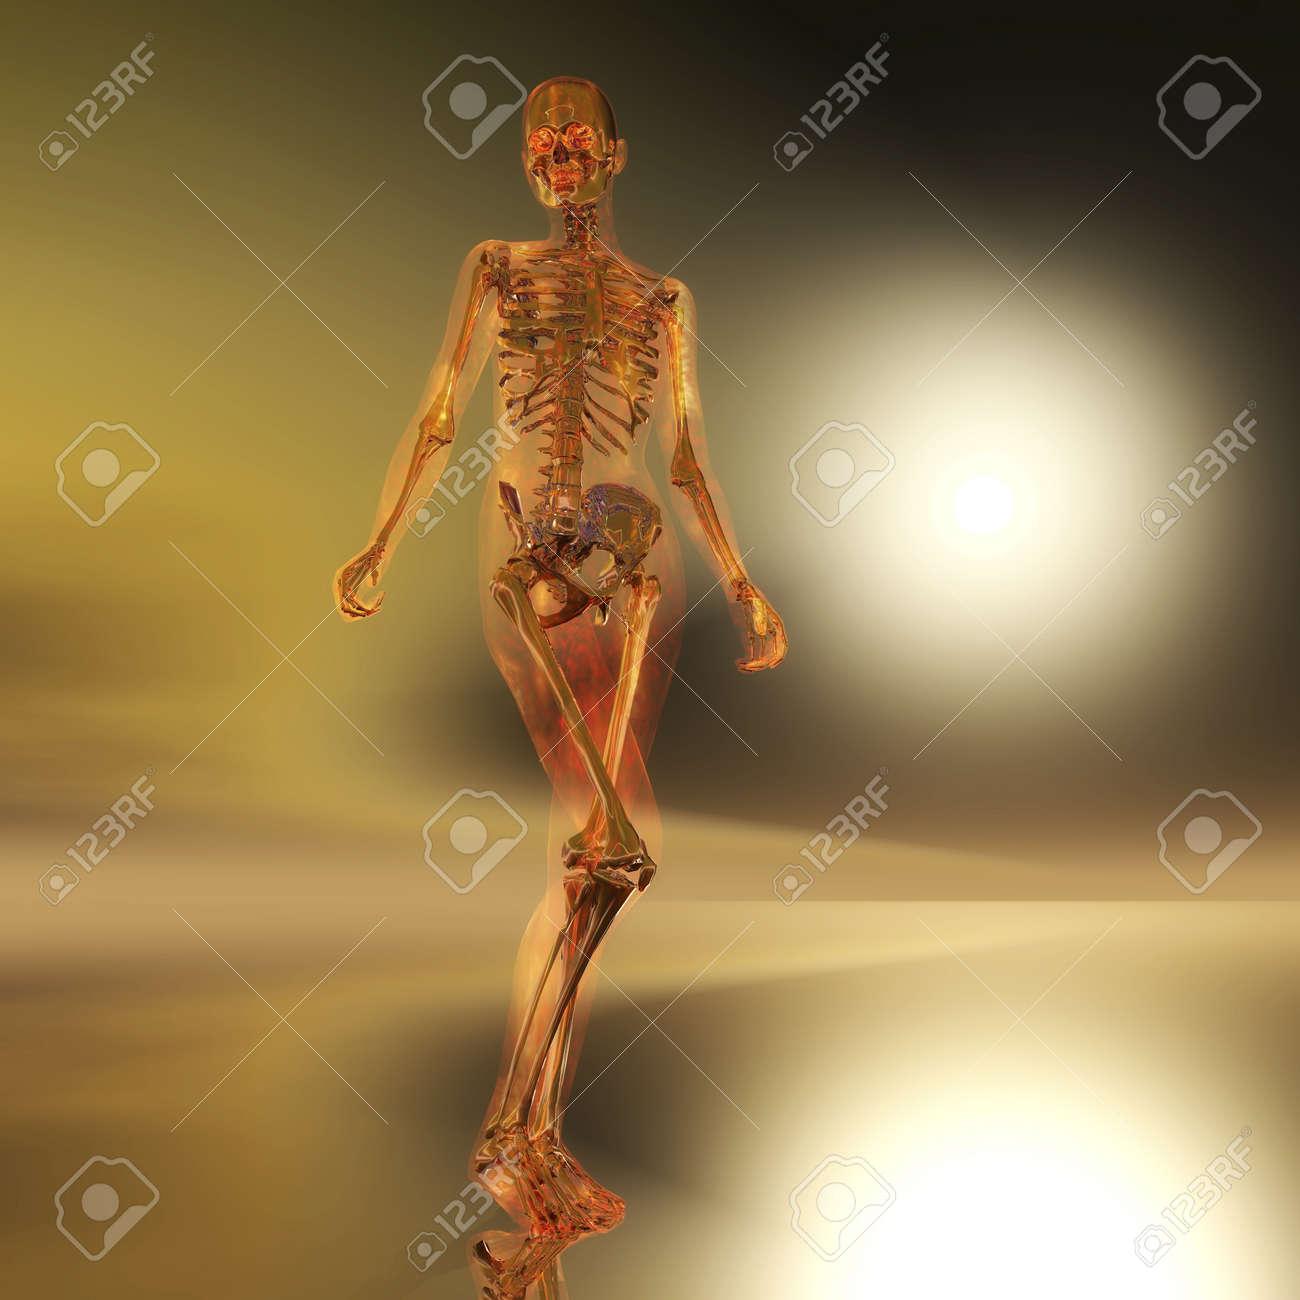 Digital Illustration of a Skeleton Stock Illustration - 21256471